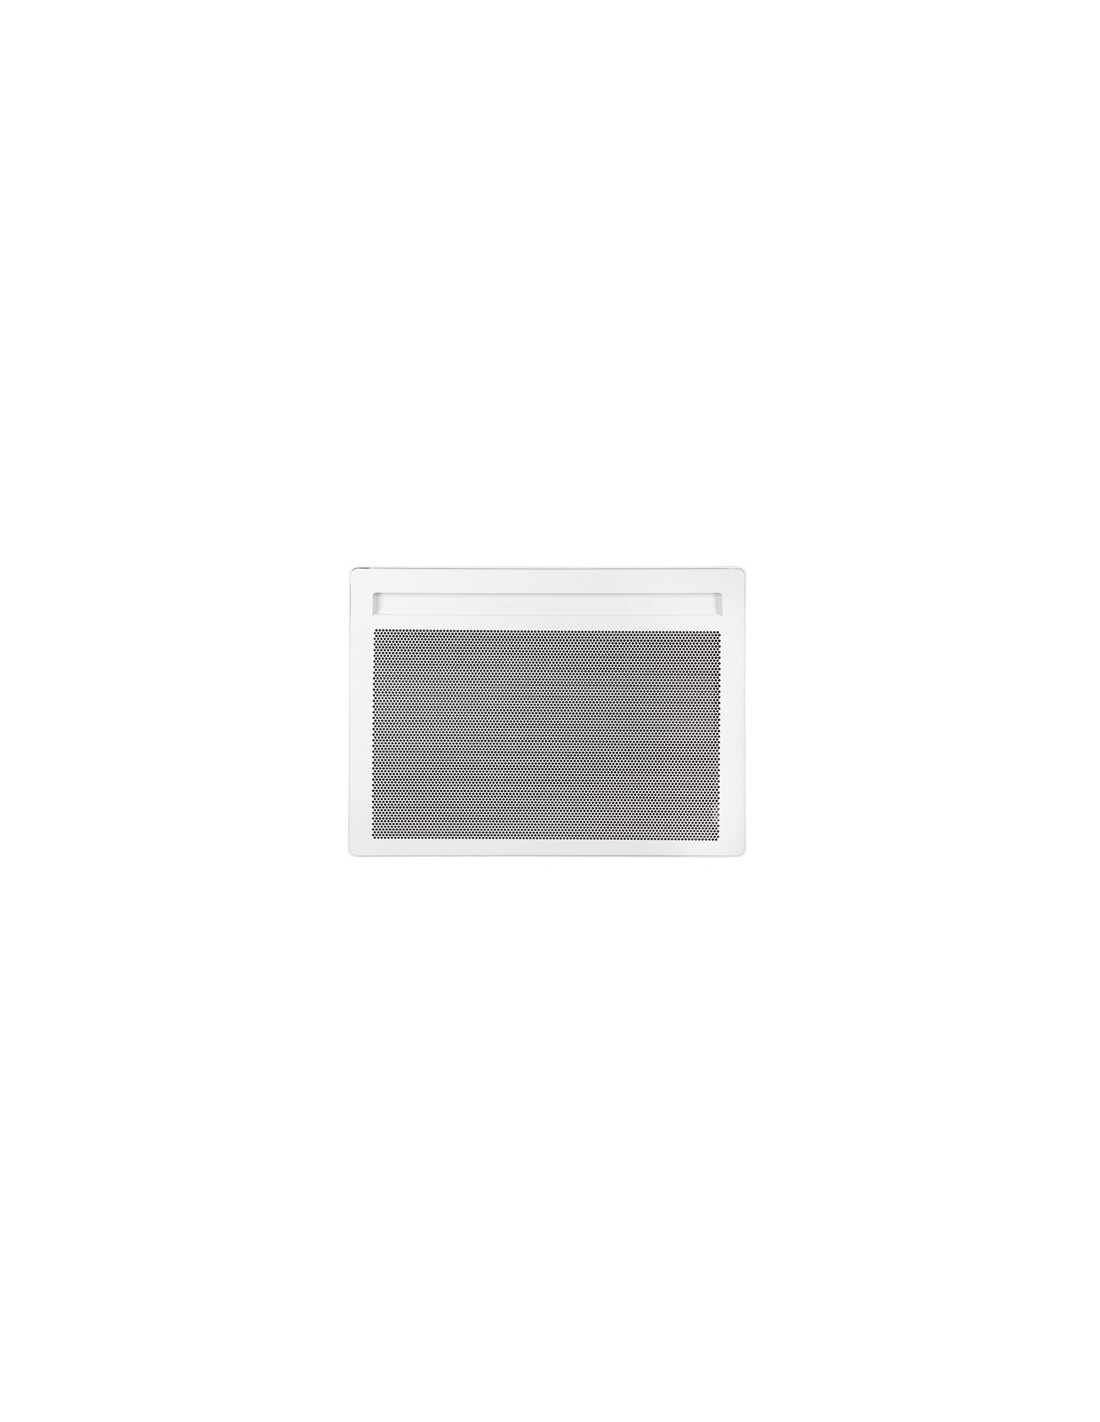 chauffage panneau rayonnant horizontal solius atlantic 1500w. Black Bedroom Furniture Sets. Home Design Ideas